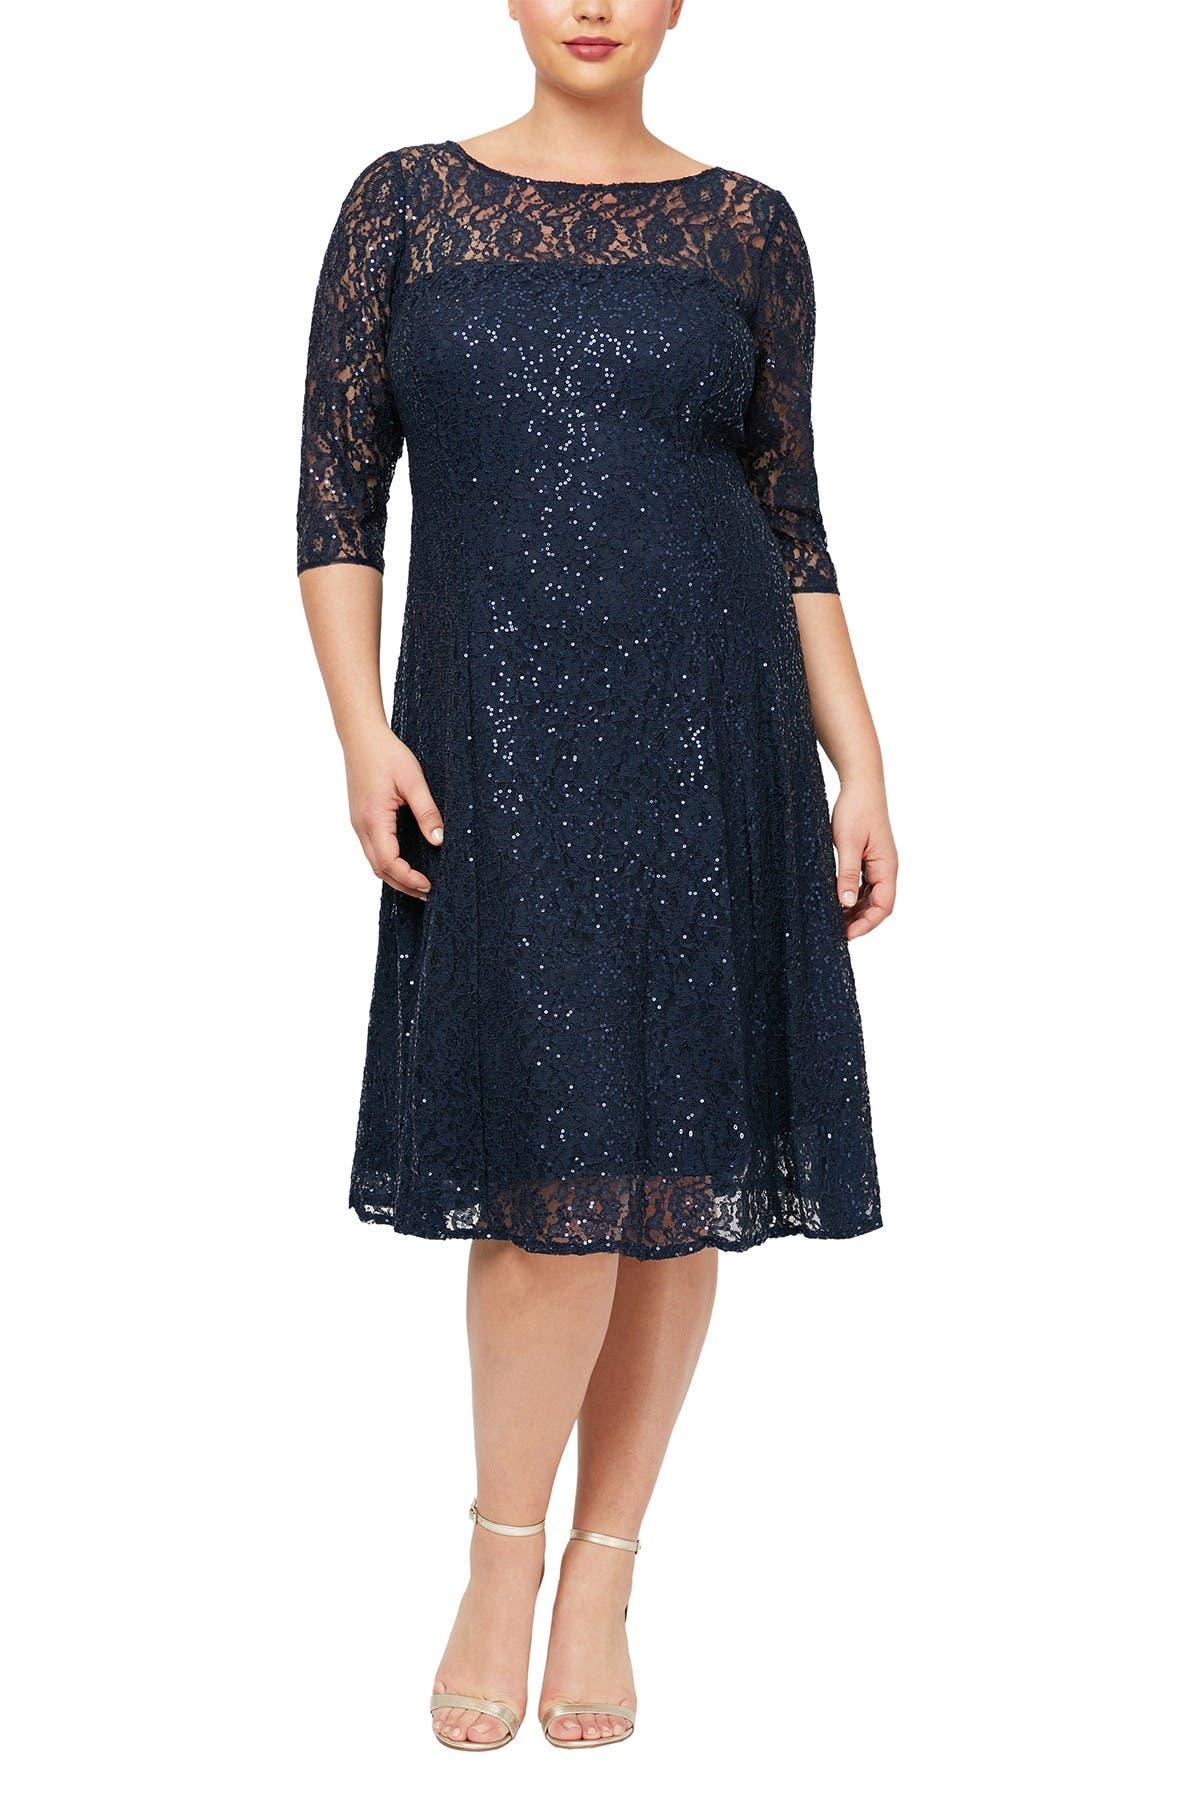 Image of SLNY Lace Yoke Glitter Dress